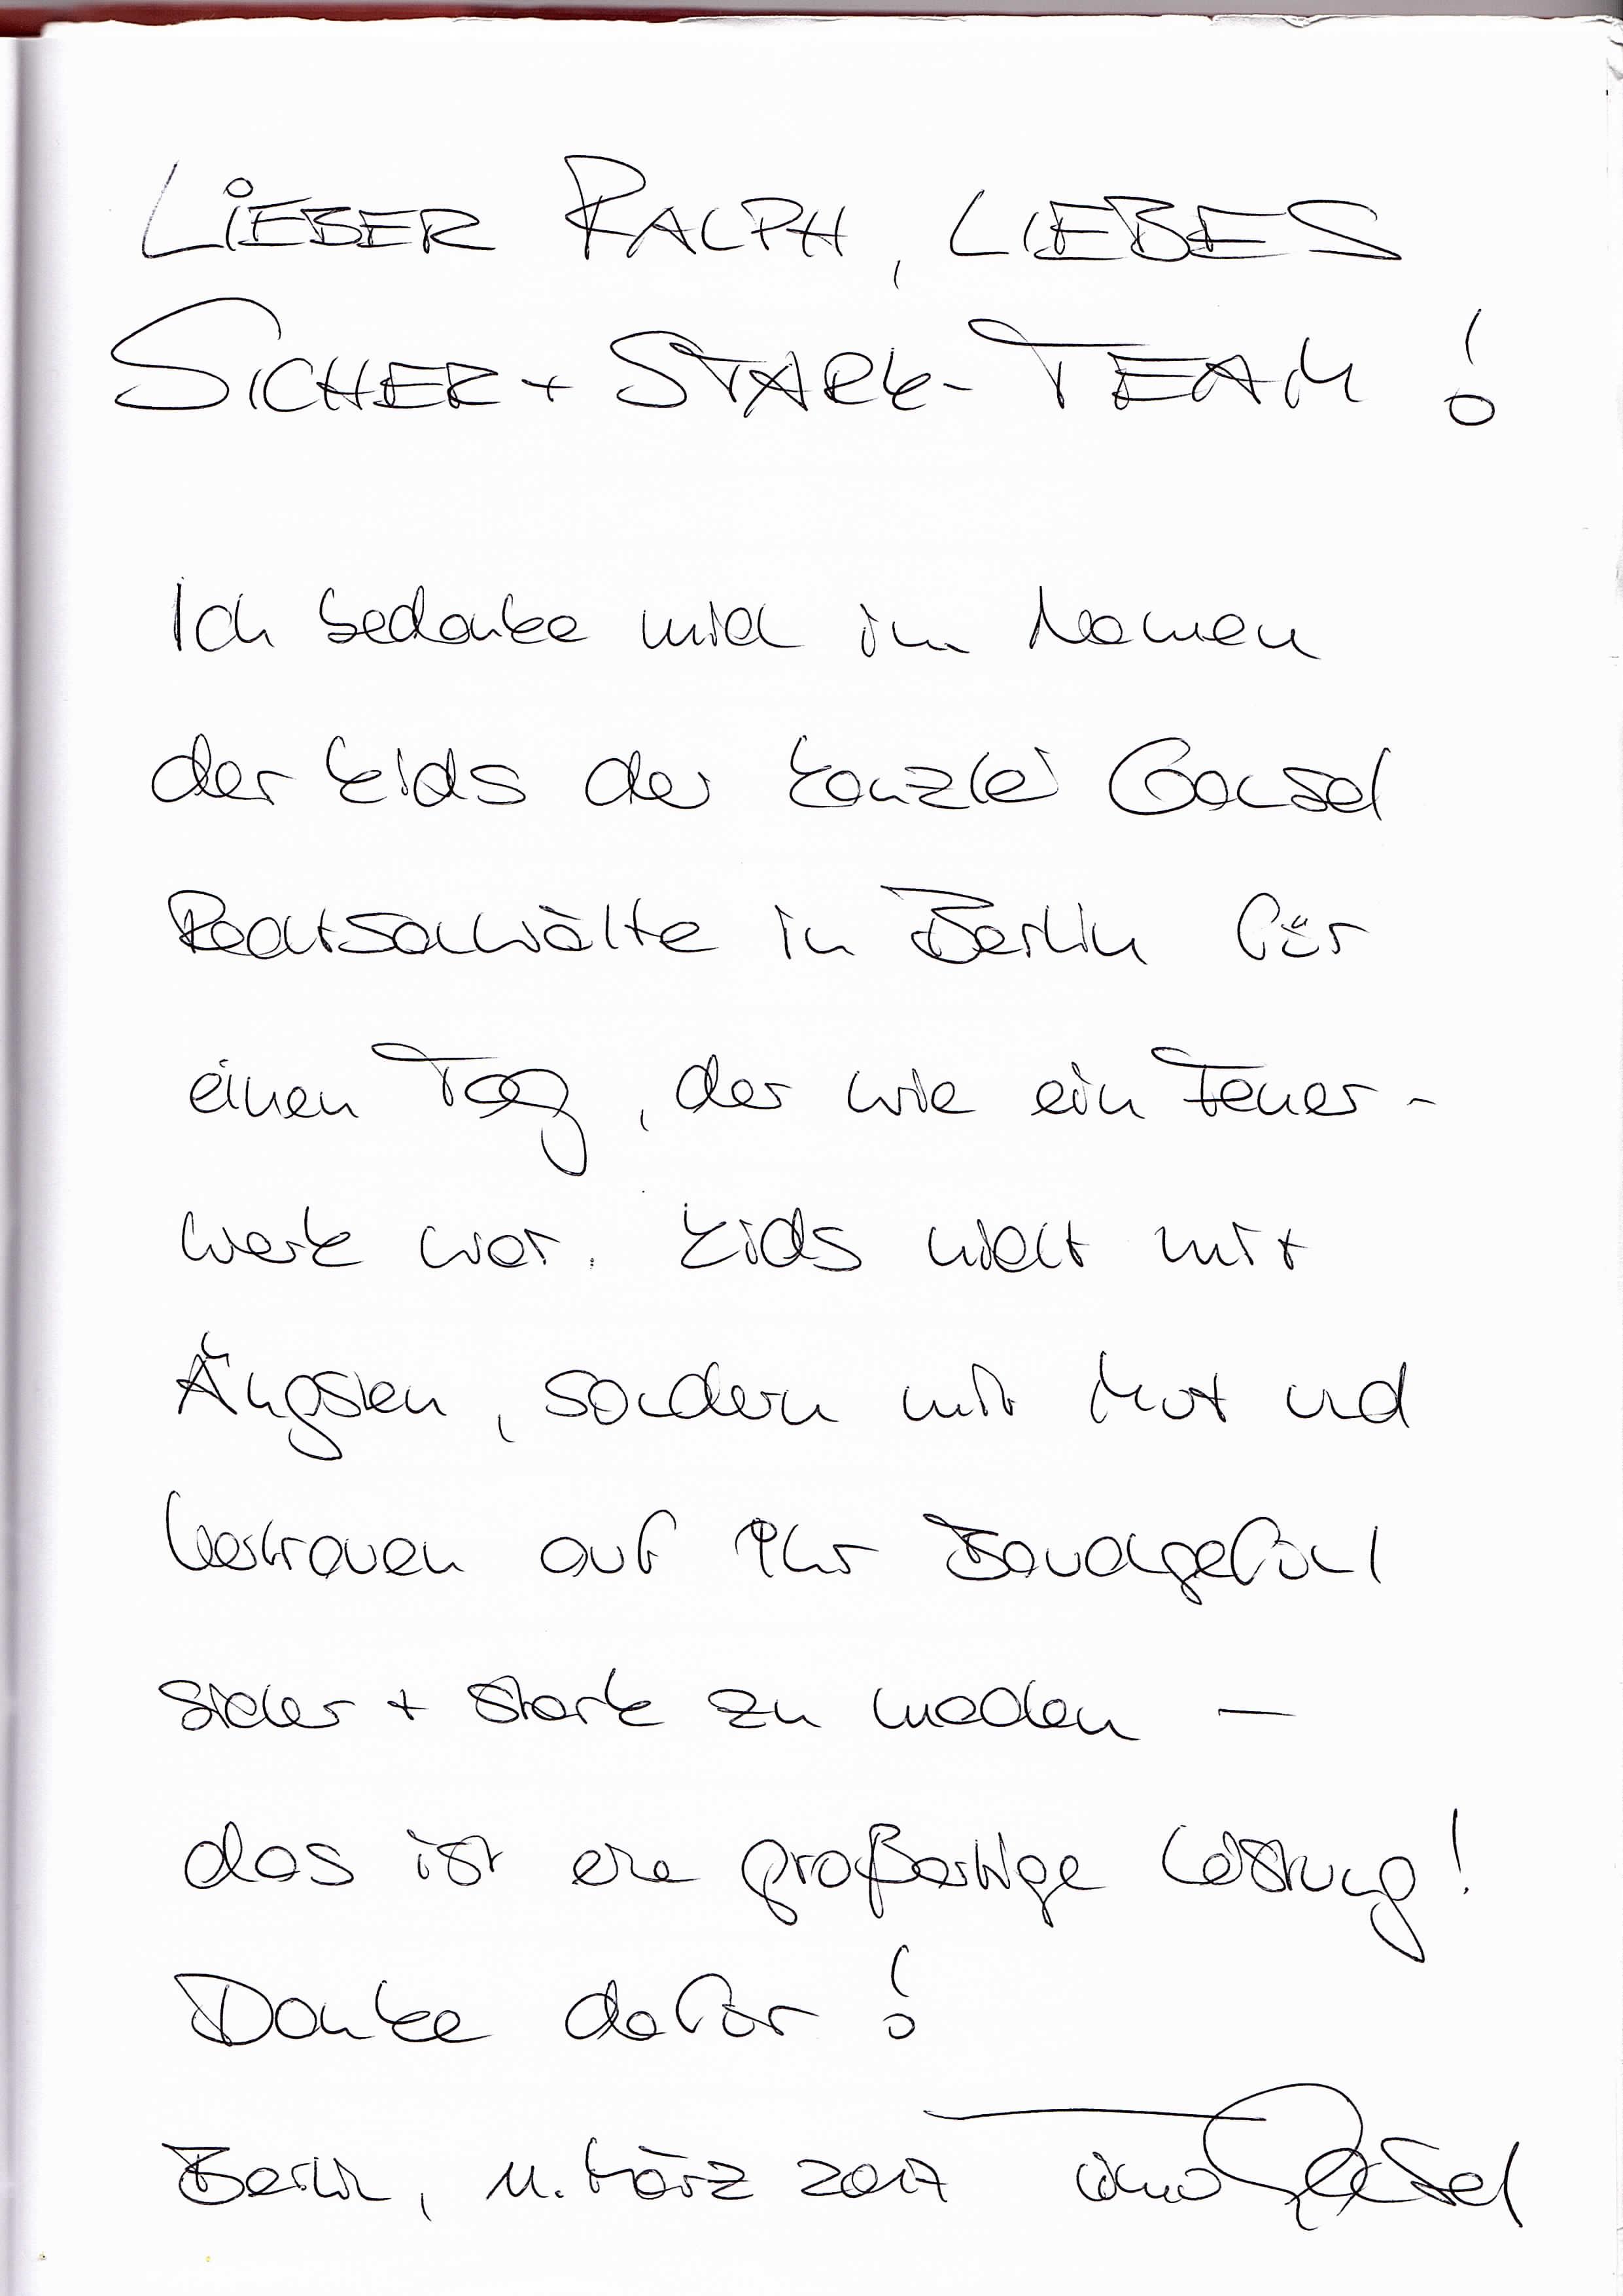 An dankeschön lehrerin brief Brief an